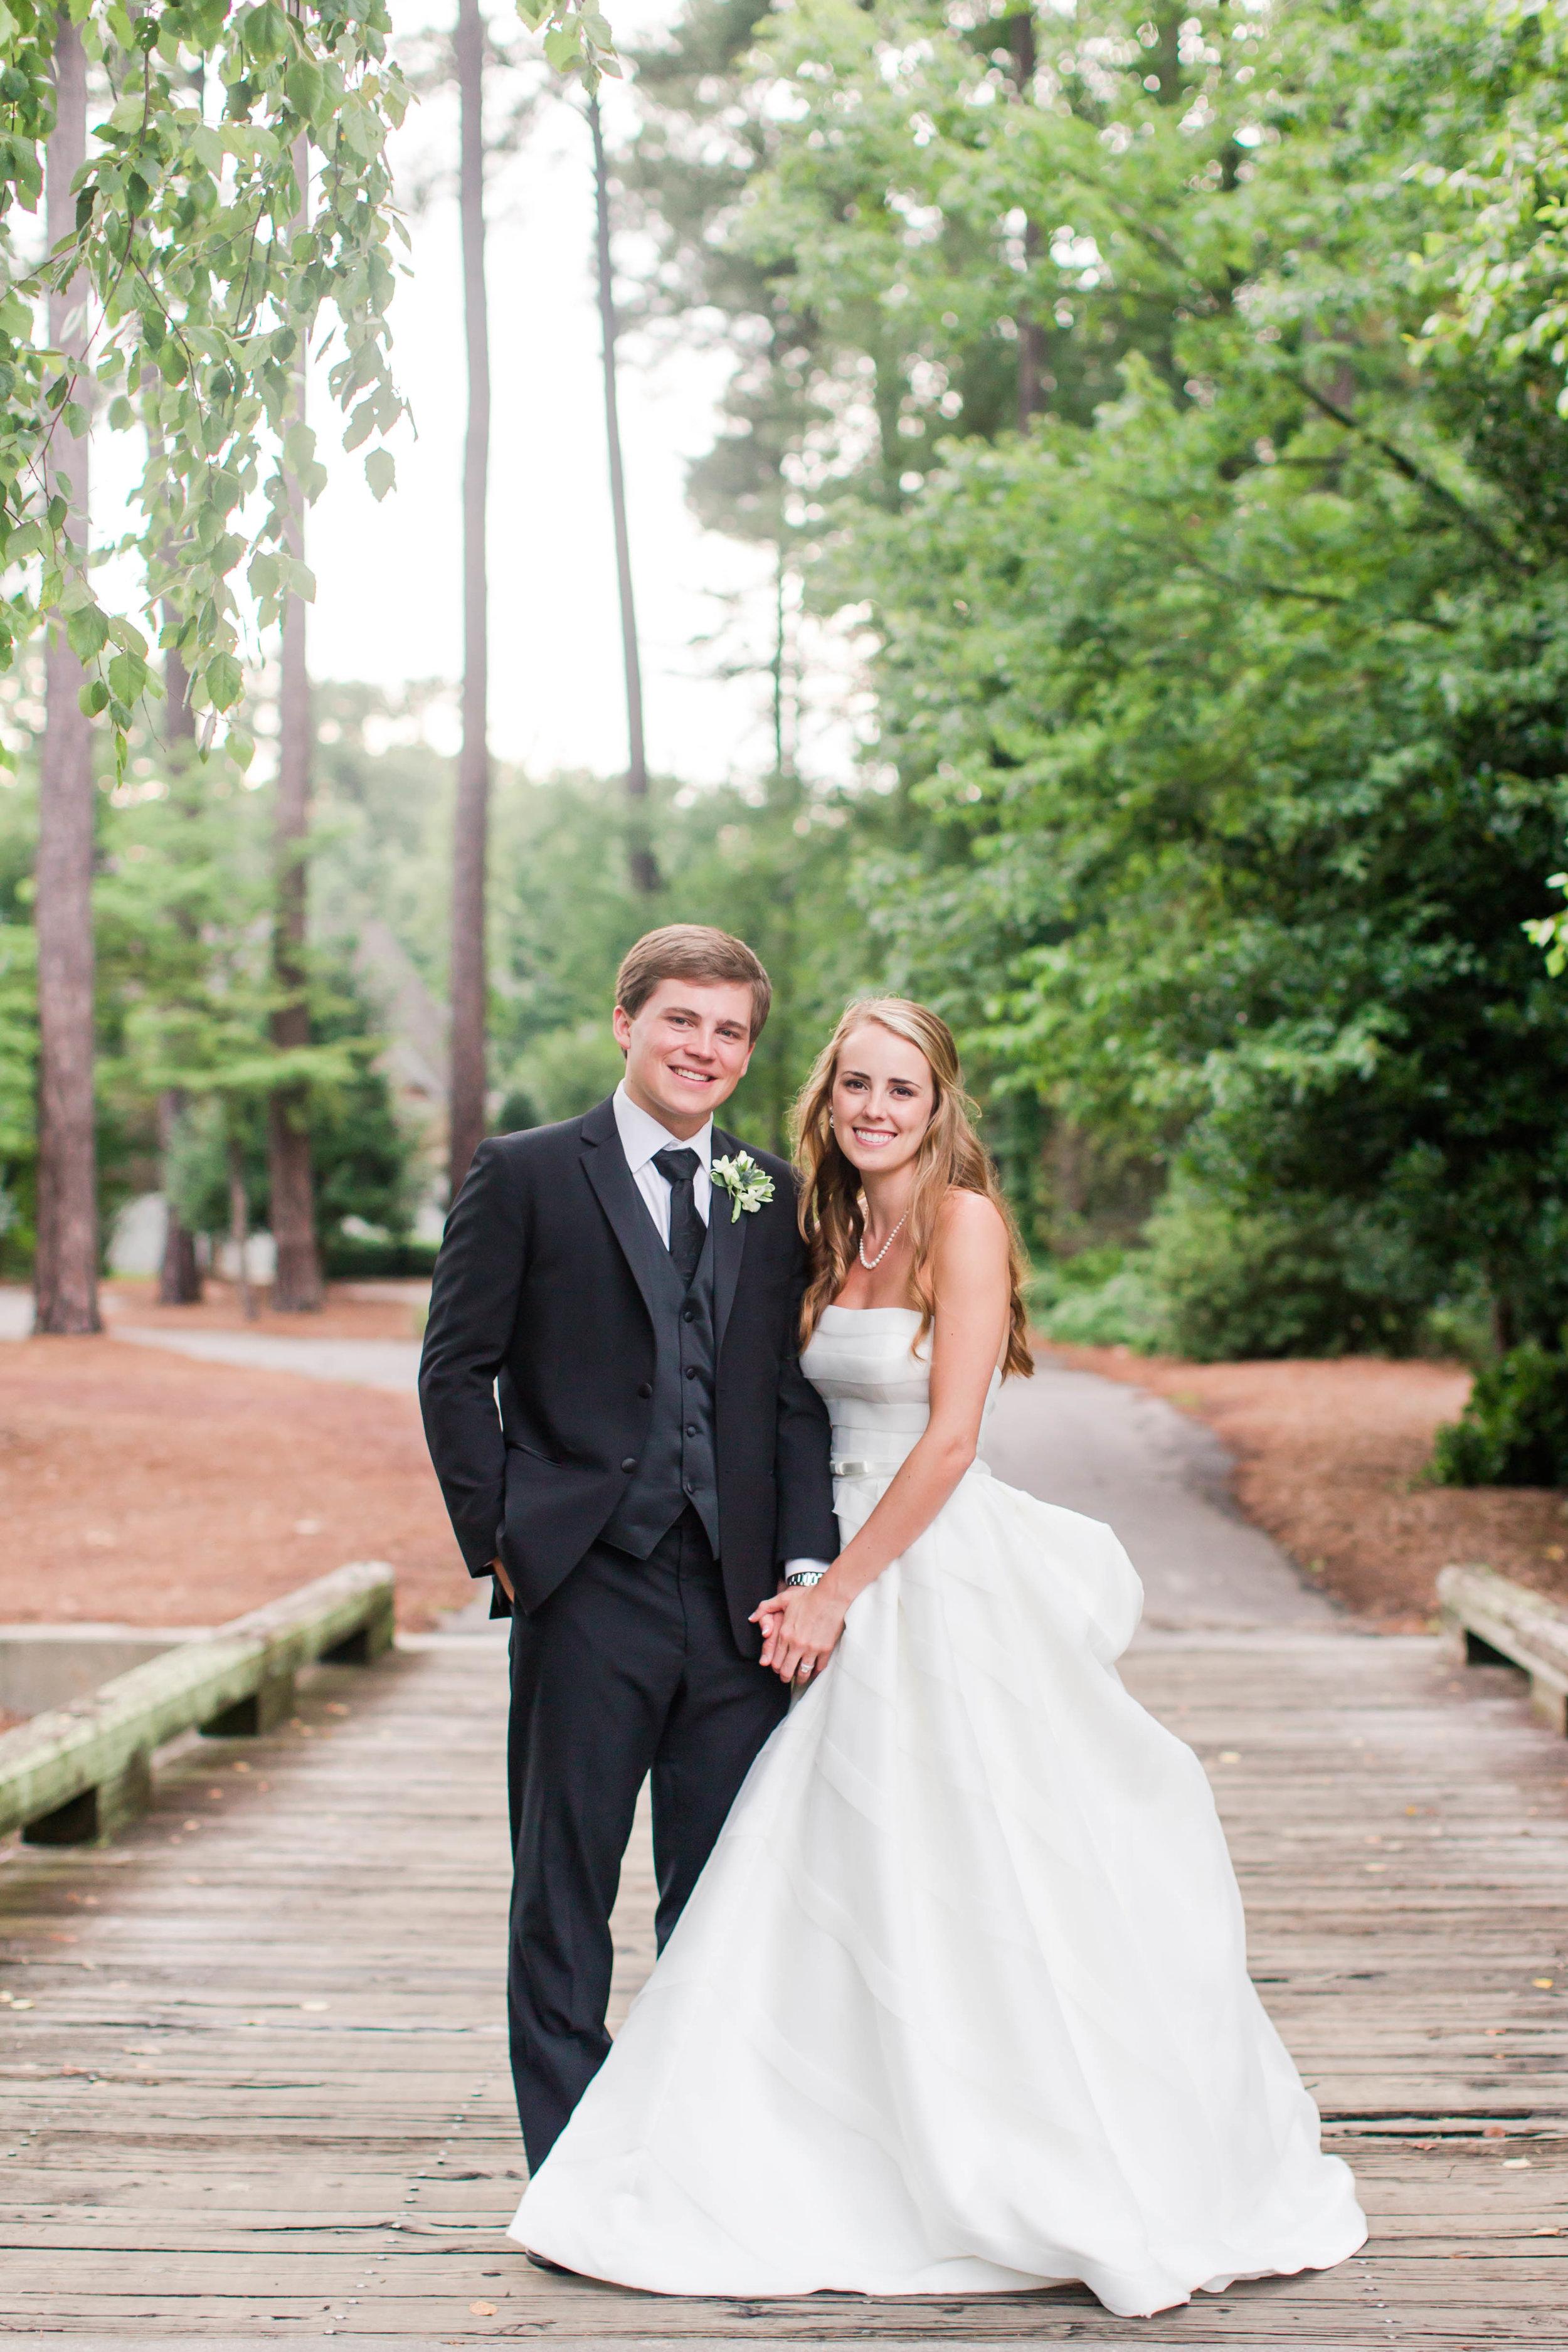 Stone_Bride and Groom_165.jpg